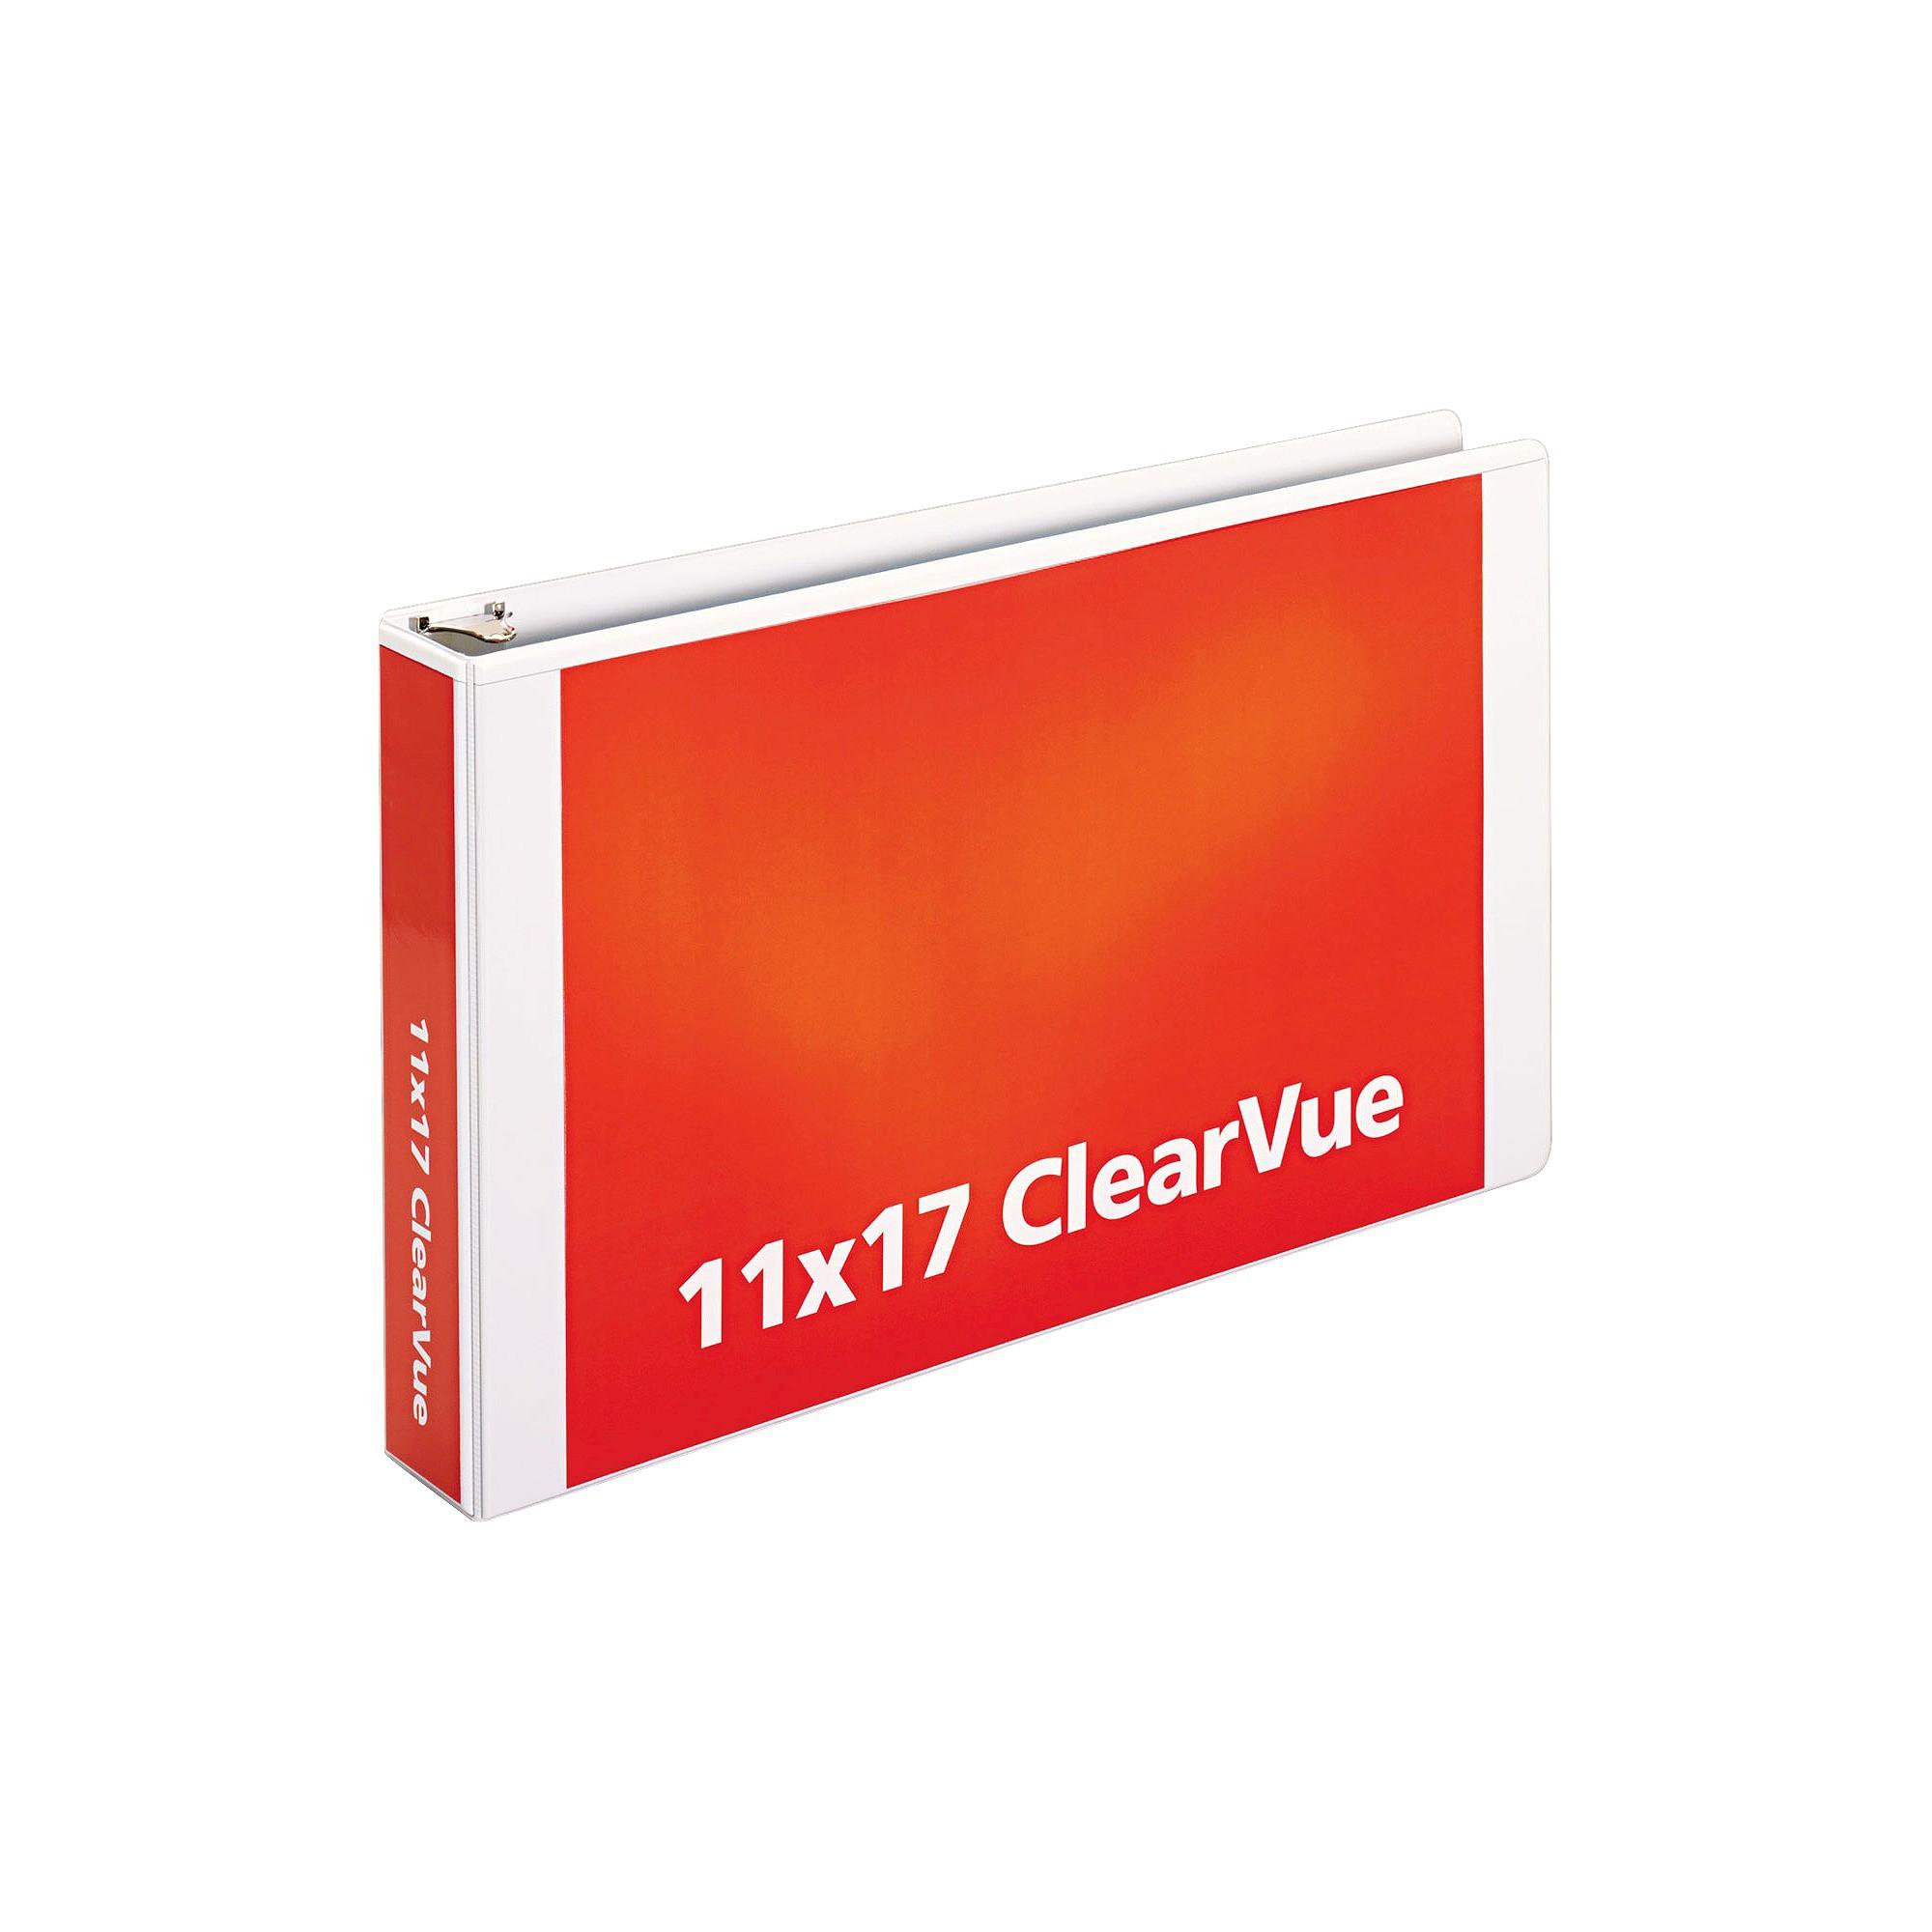 "Cardinal 11 X 17 ClearVue Slant-D Ring Binder, 2"" Cap"